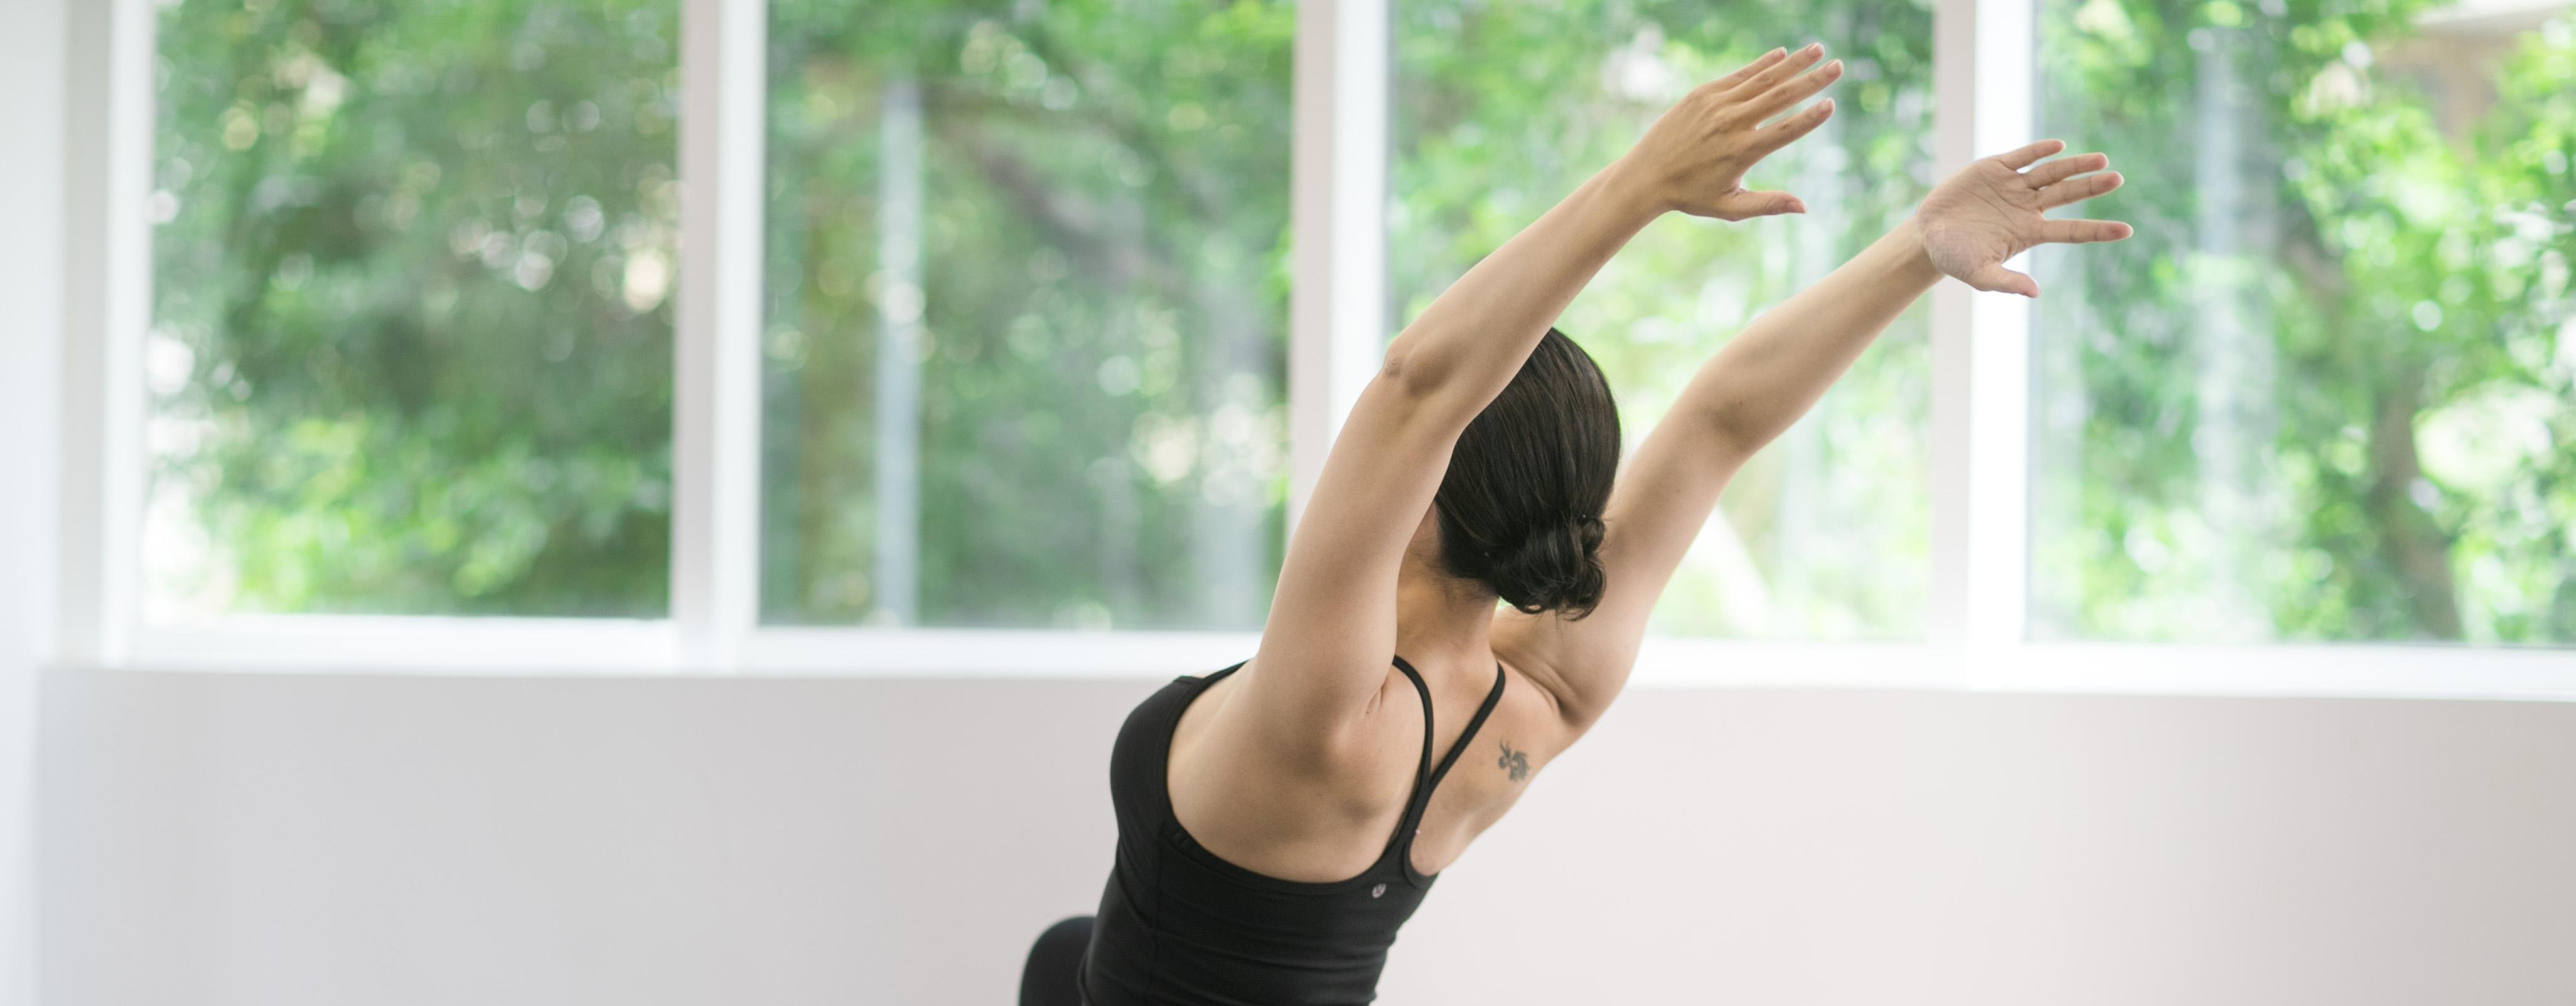 YogaJourney瑜珈旅程